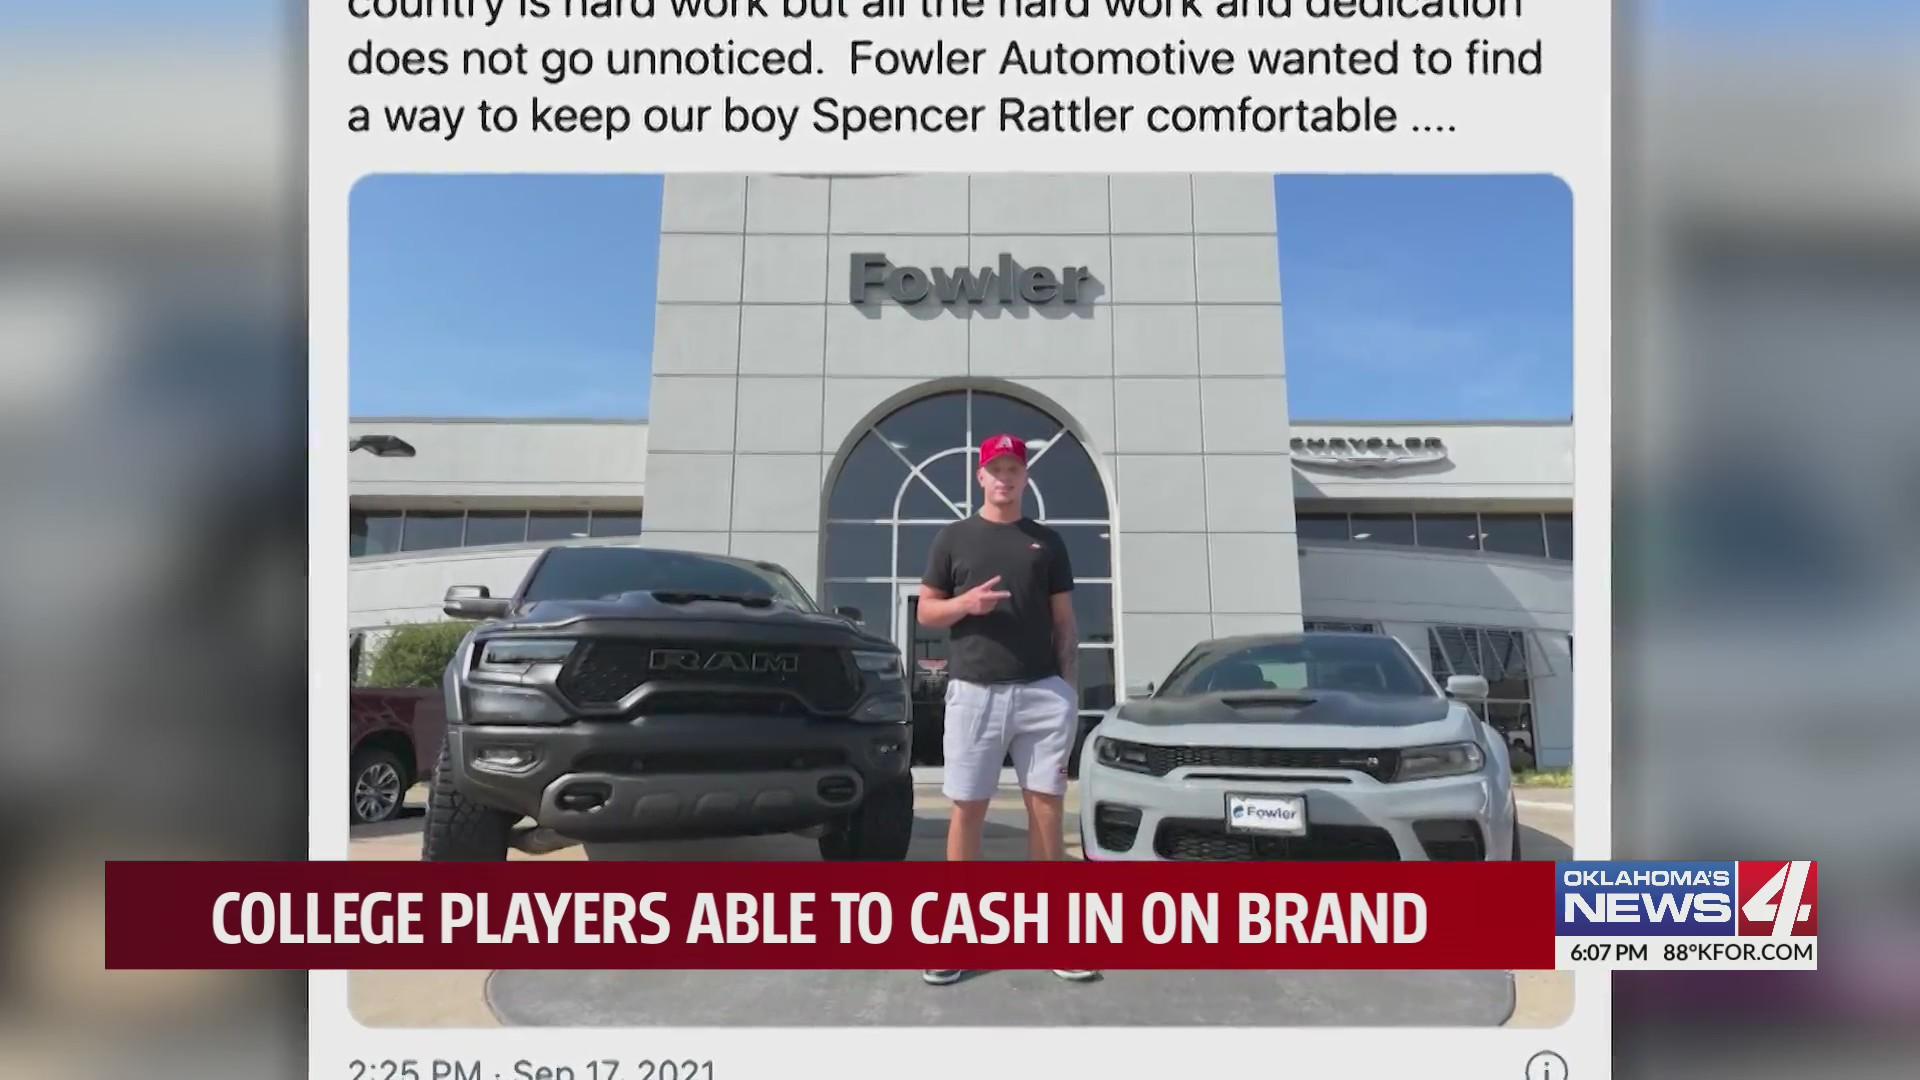 Social media post shows college athlete promoting Fowler Honda